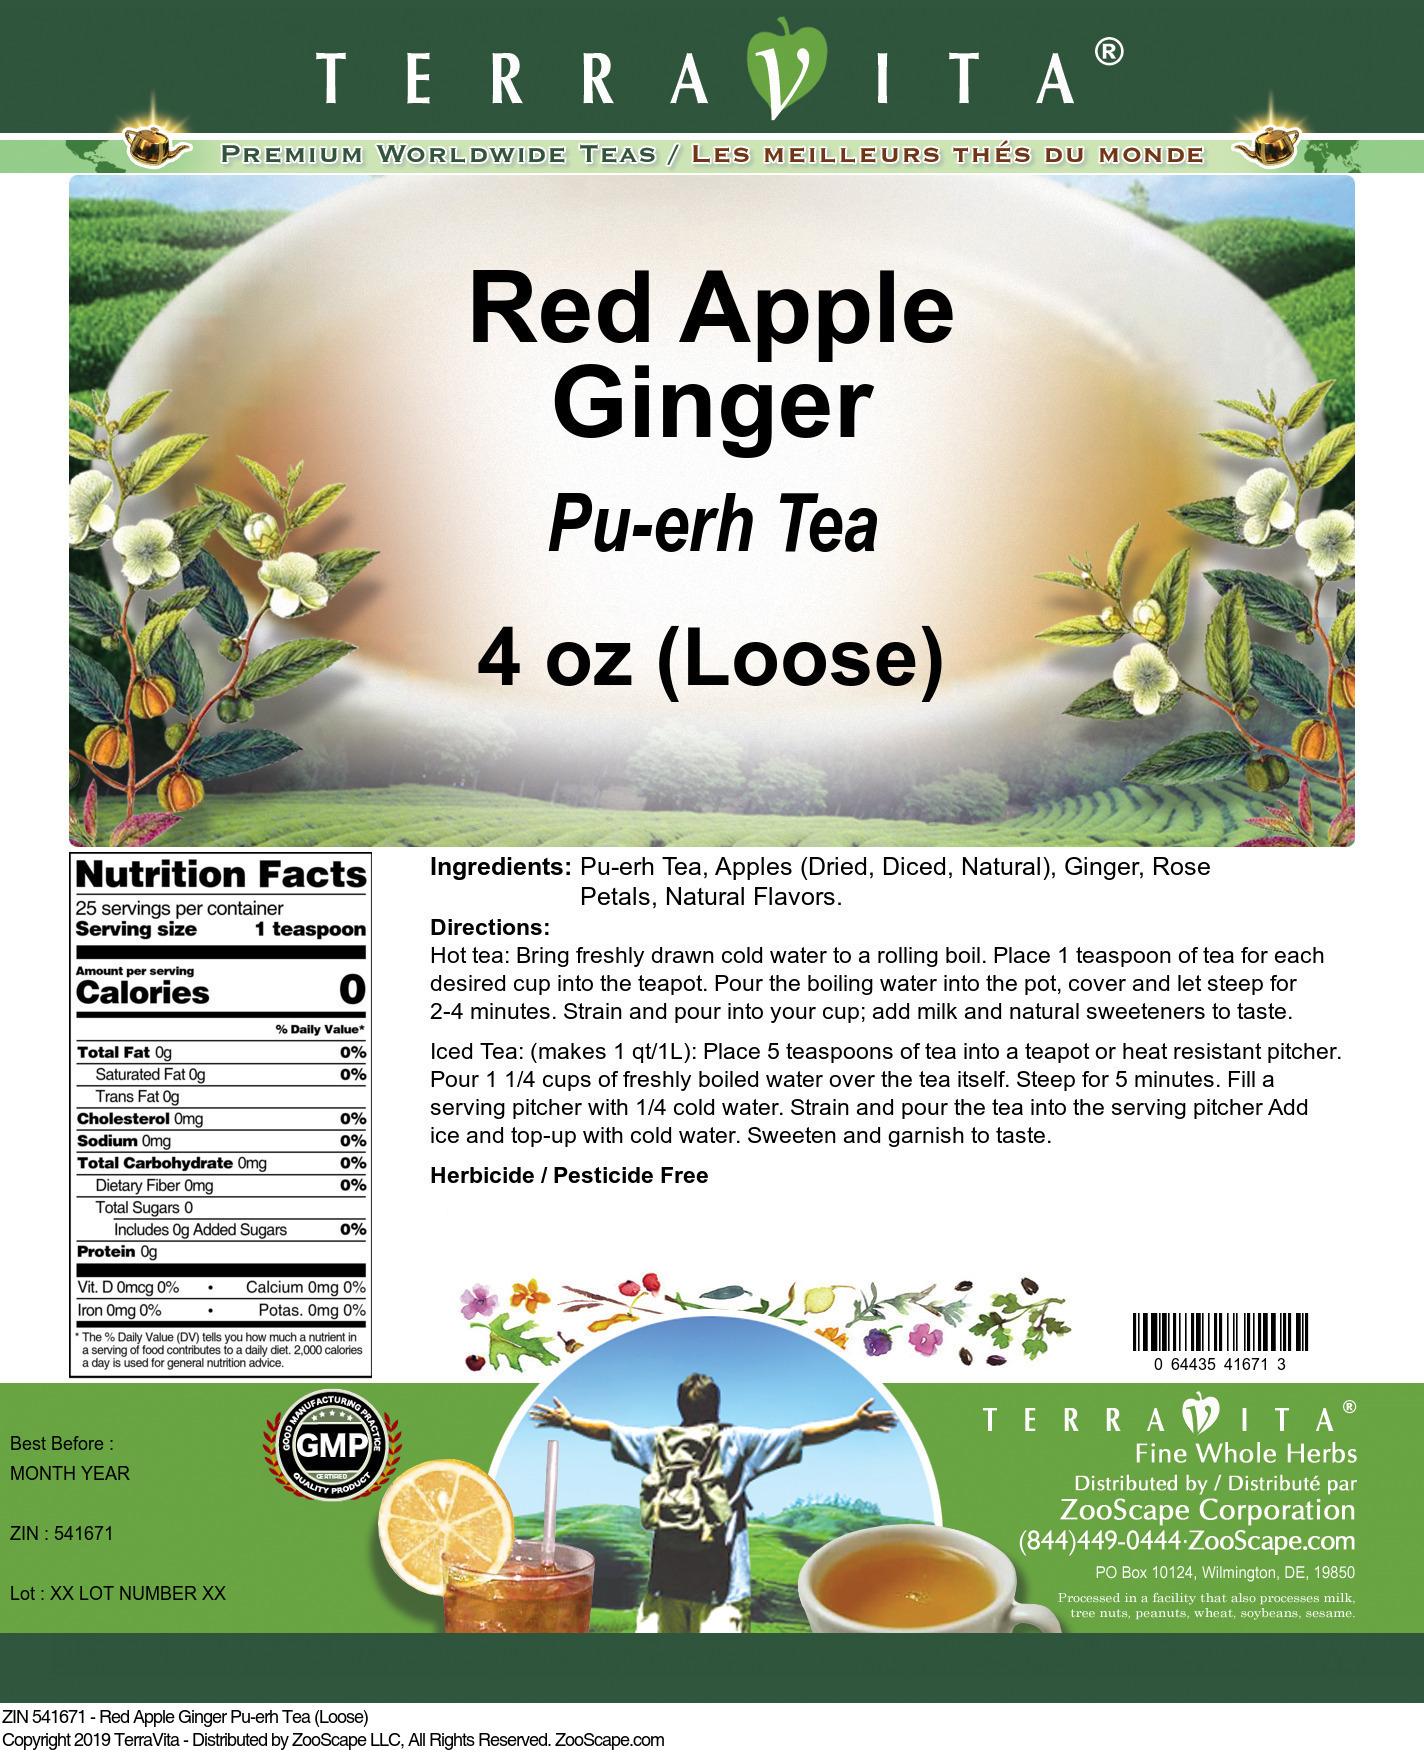 Red Apple Ginger Pu-erh Tea (Loose)